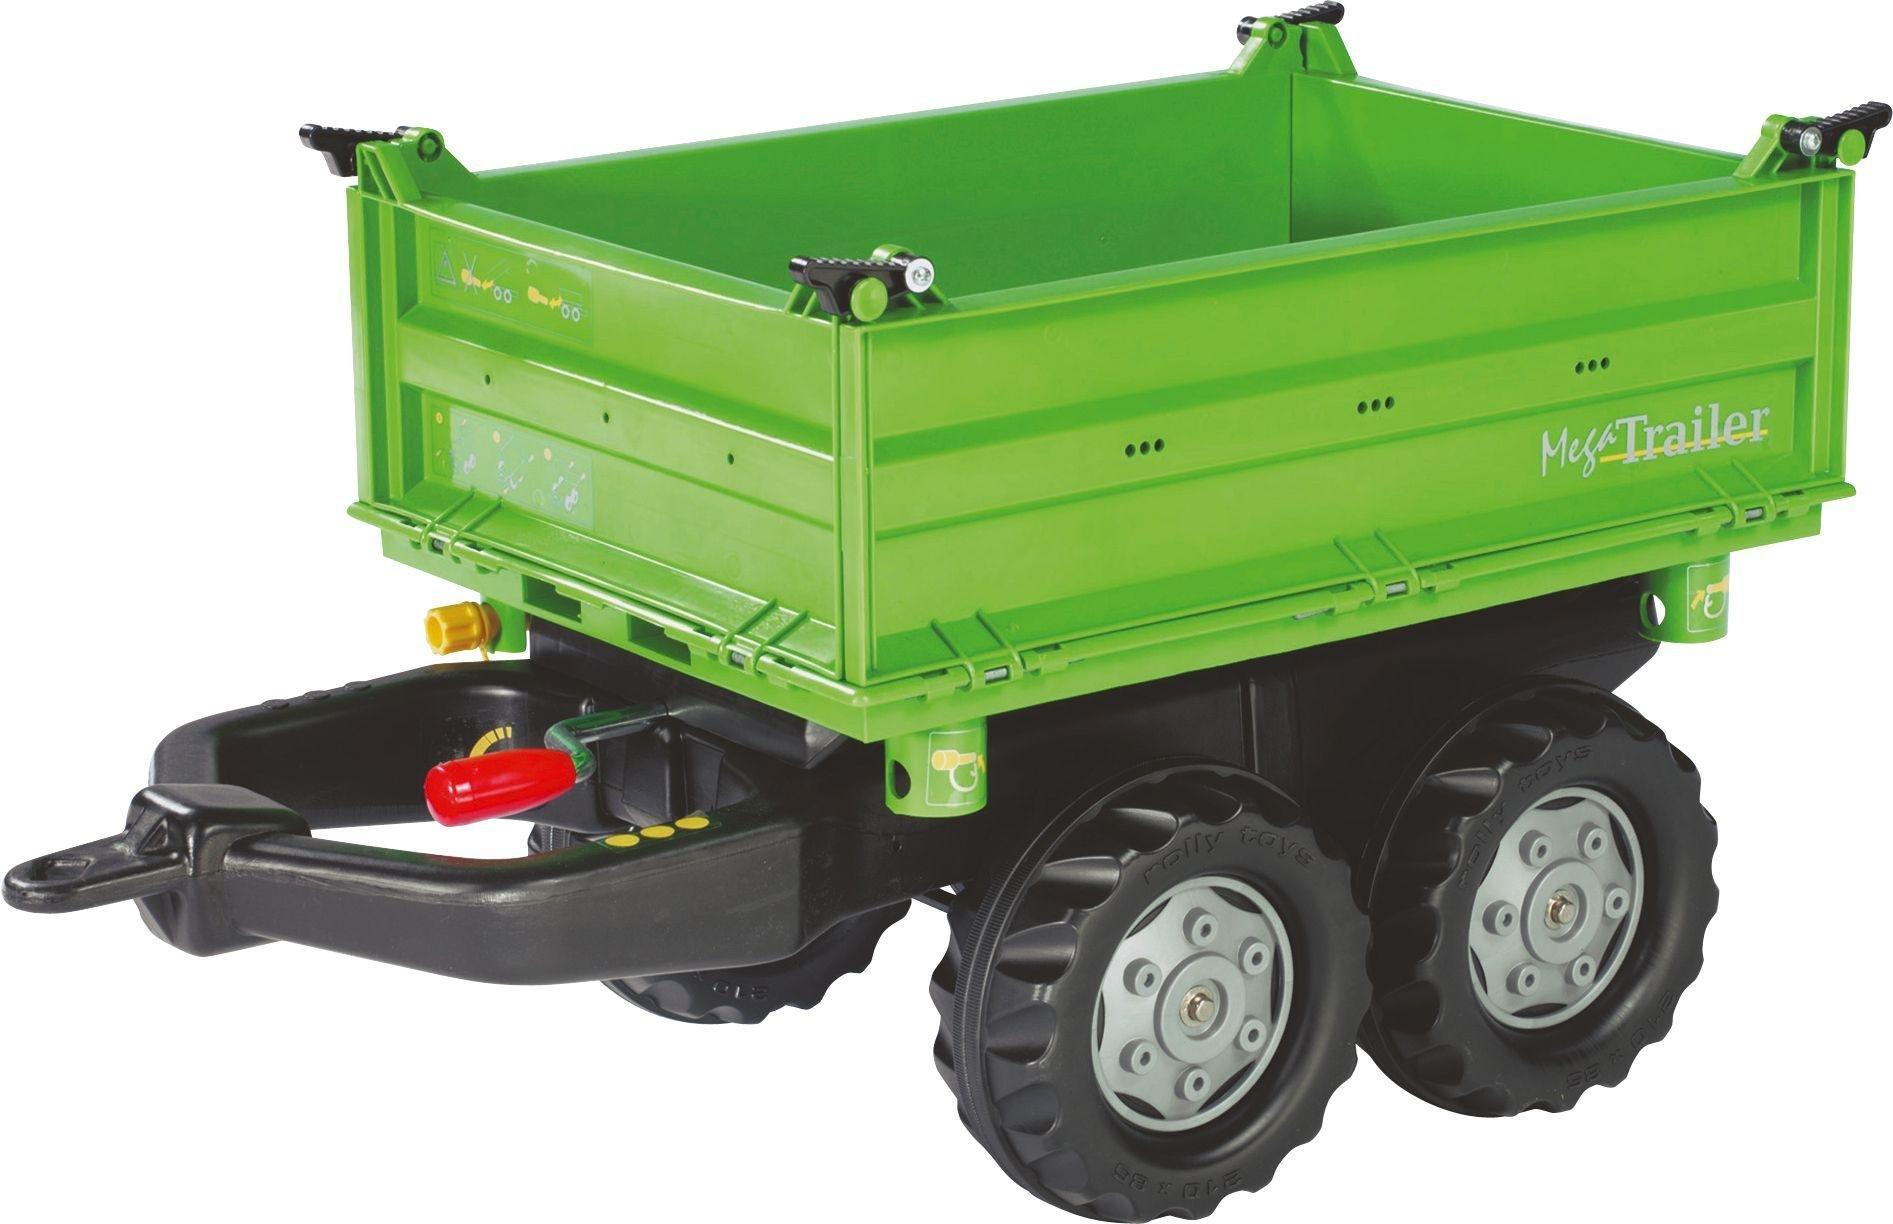 green-mega-trailer-for-child-tractor